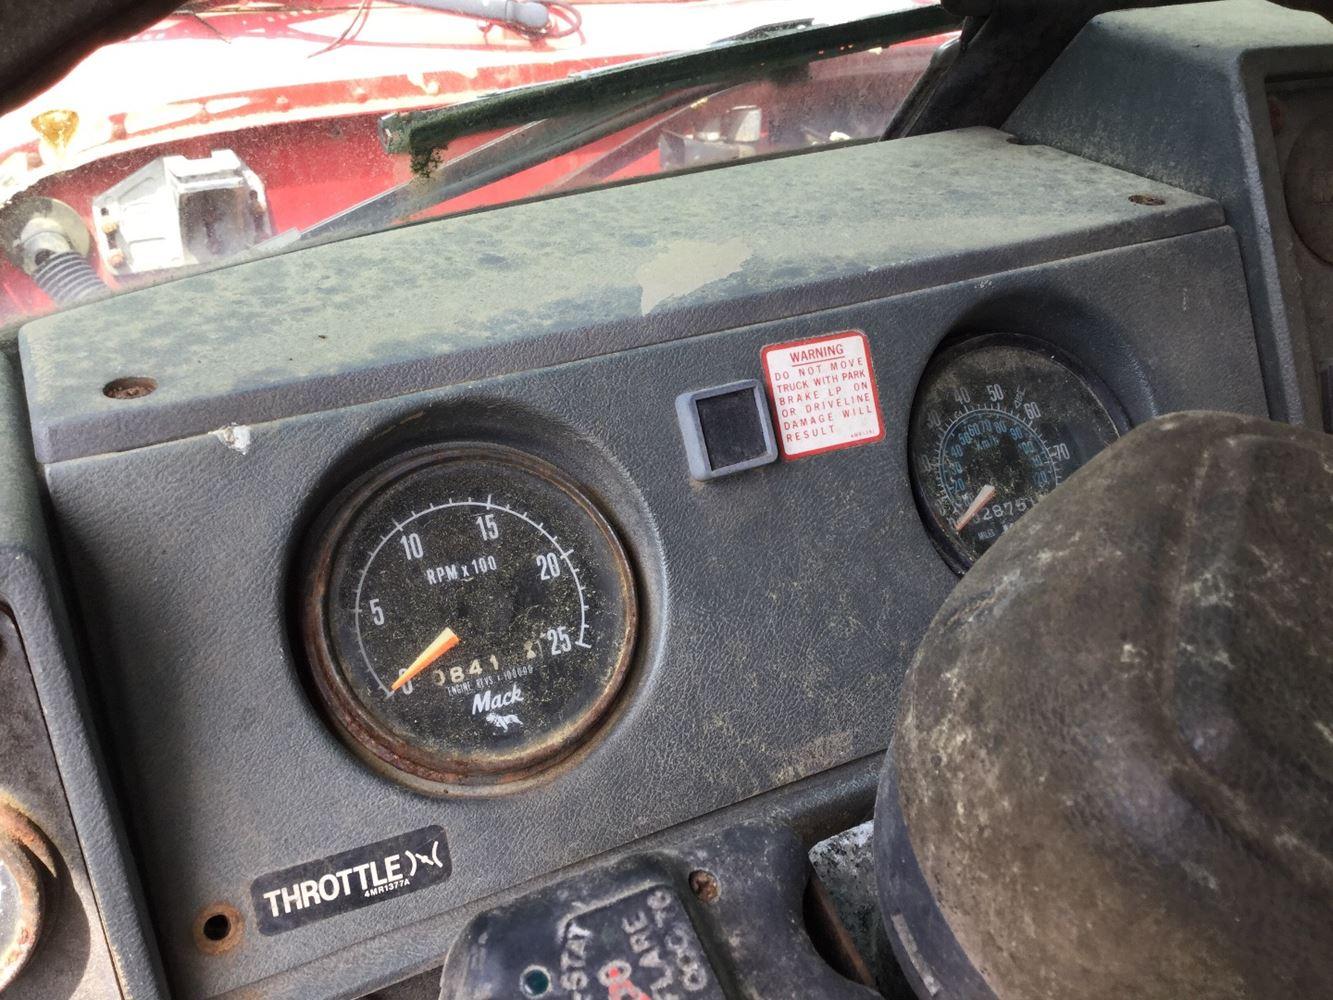 1989 Mack RD690S (Stock #SALVAGE-609-DASH-027) | Dash Ass'ys